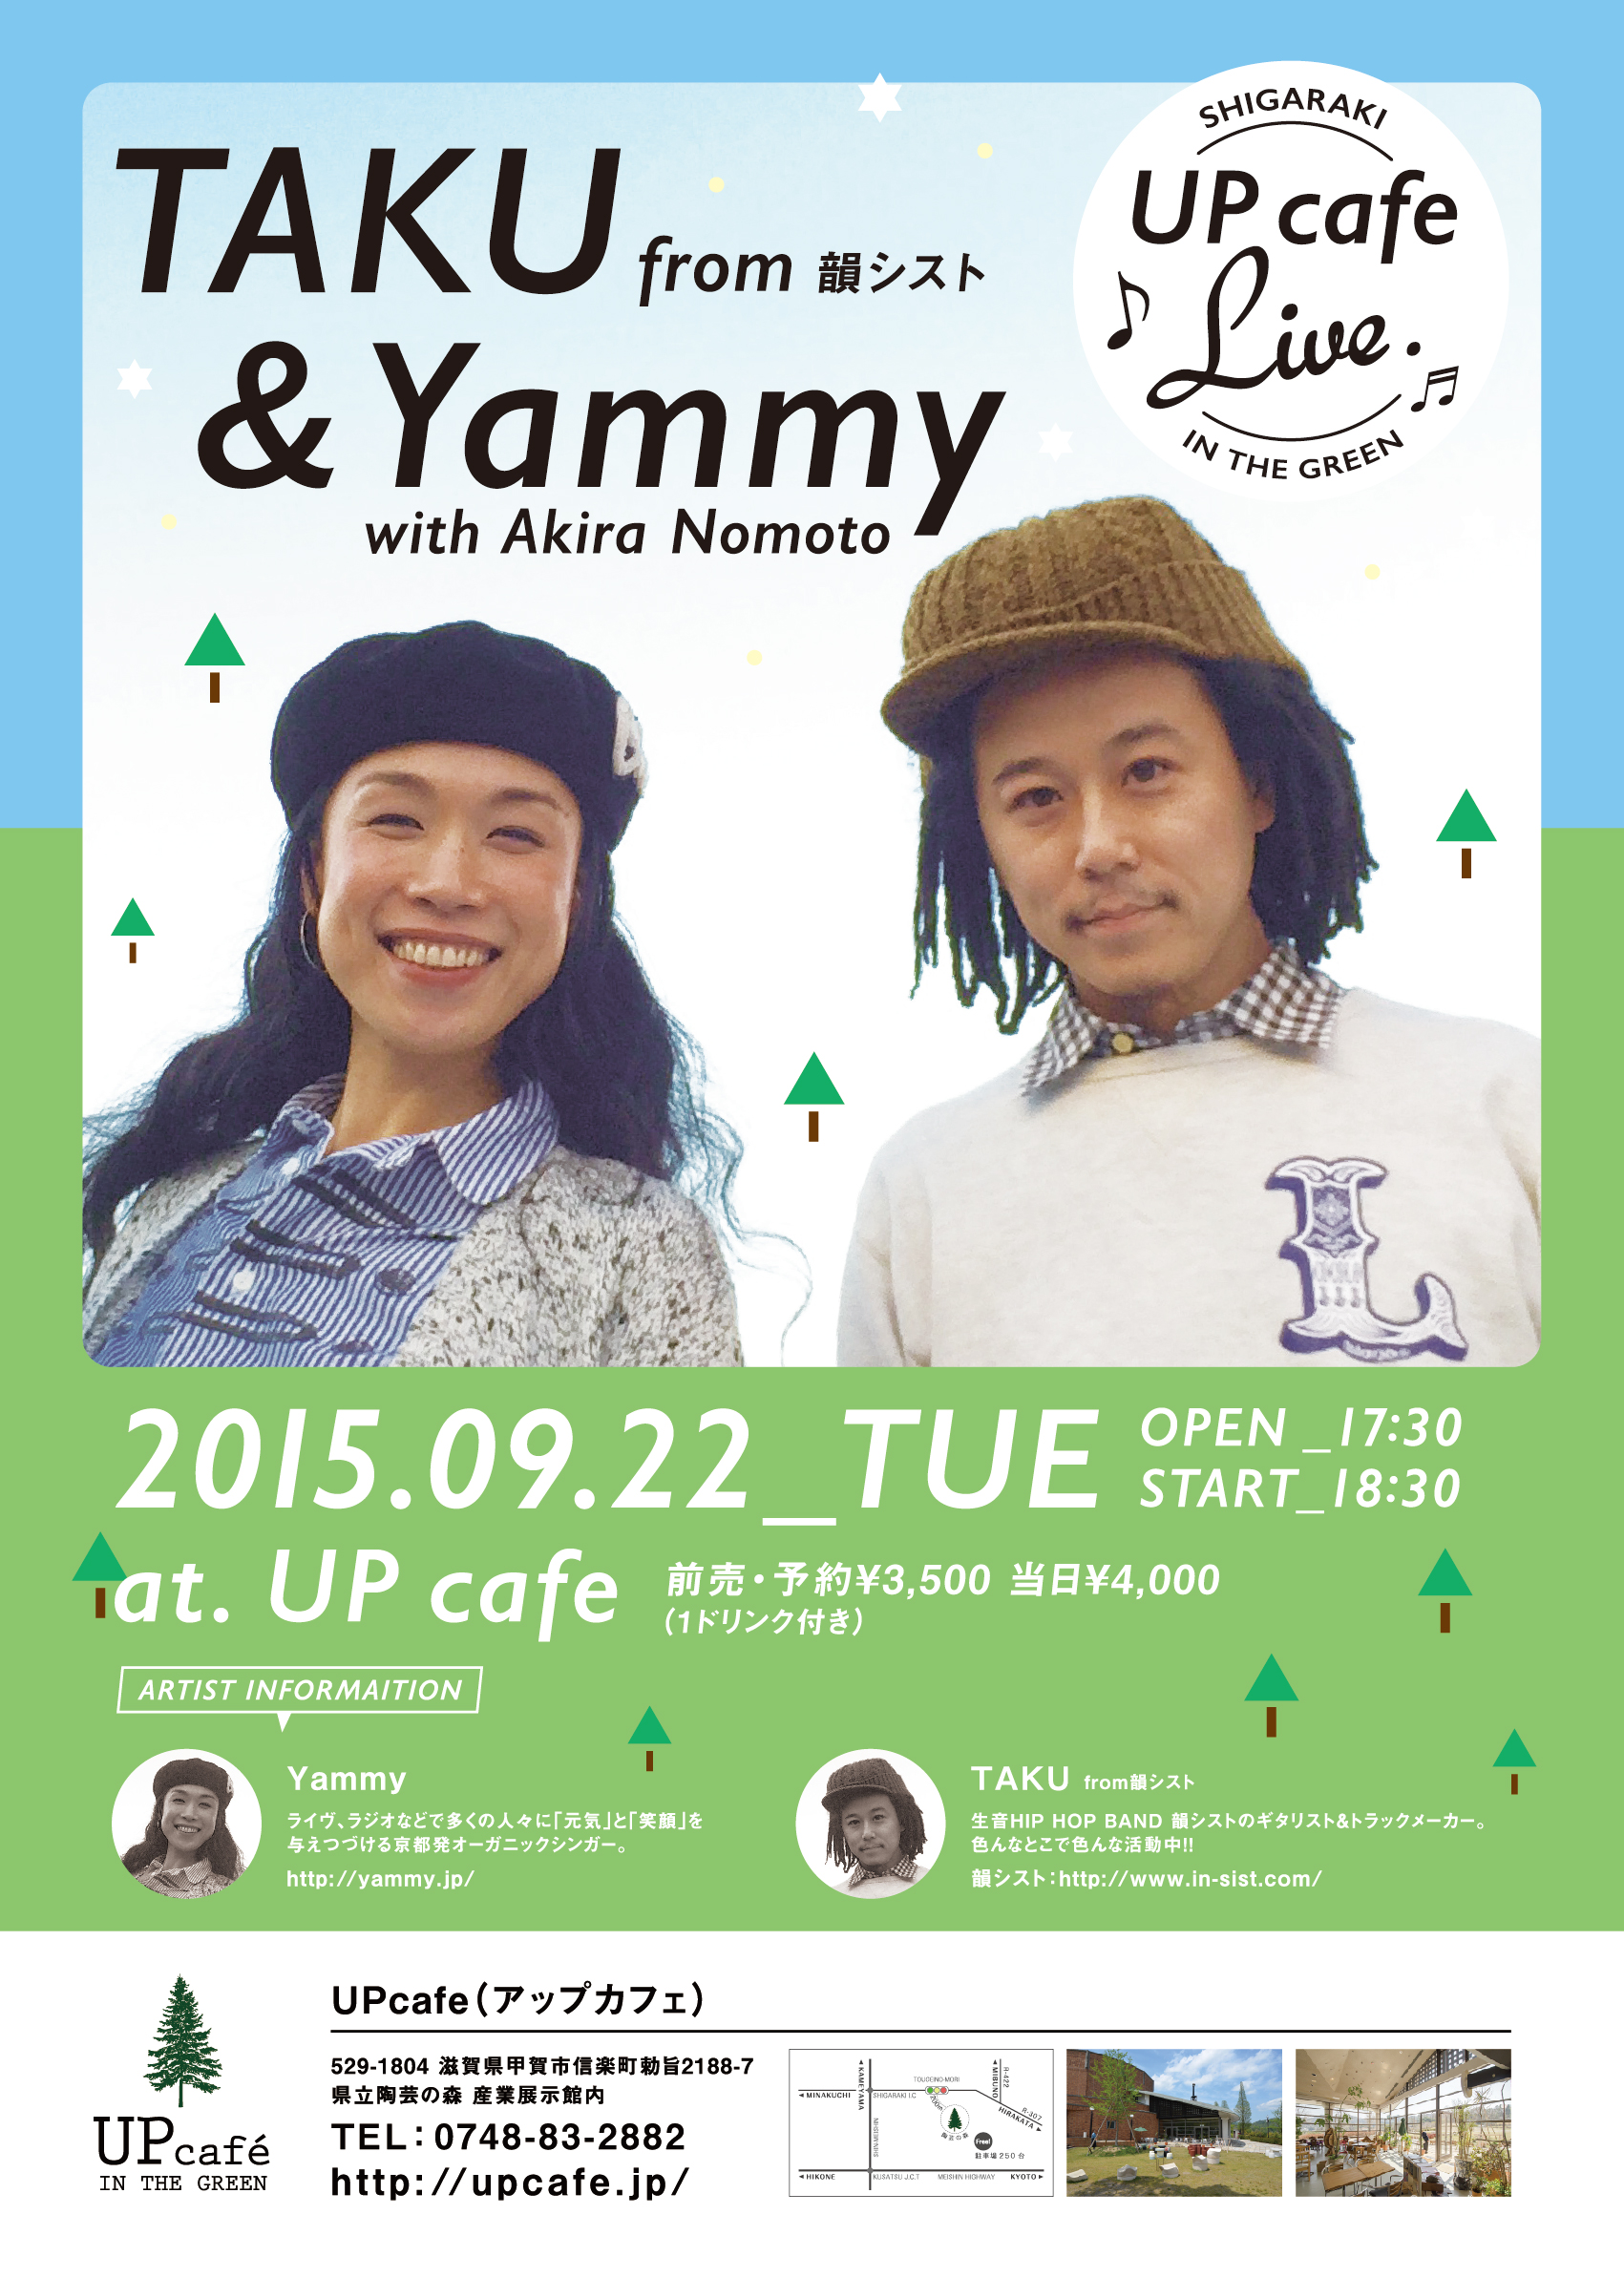 _TAKU&Yammy_UPcafe_0922_cs6ol-01